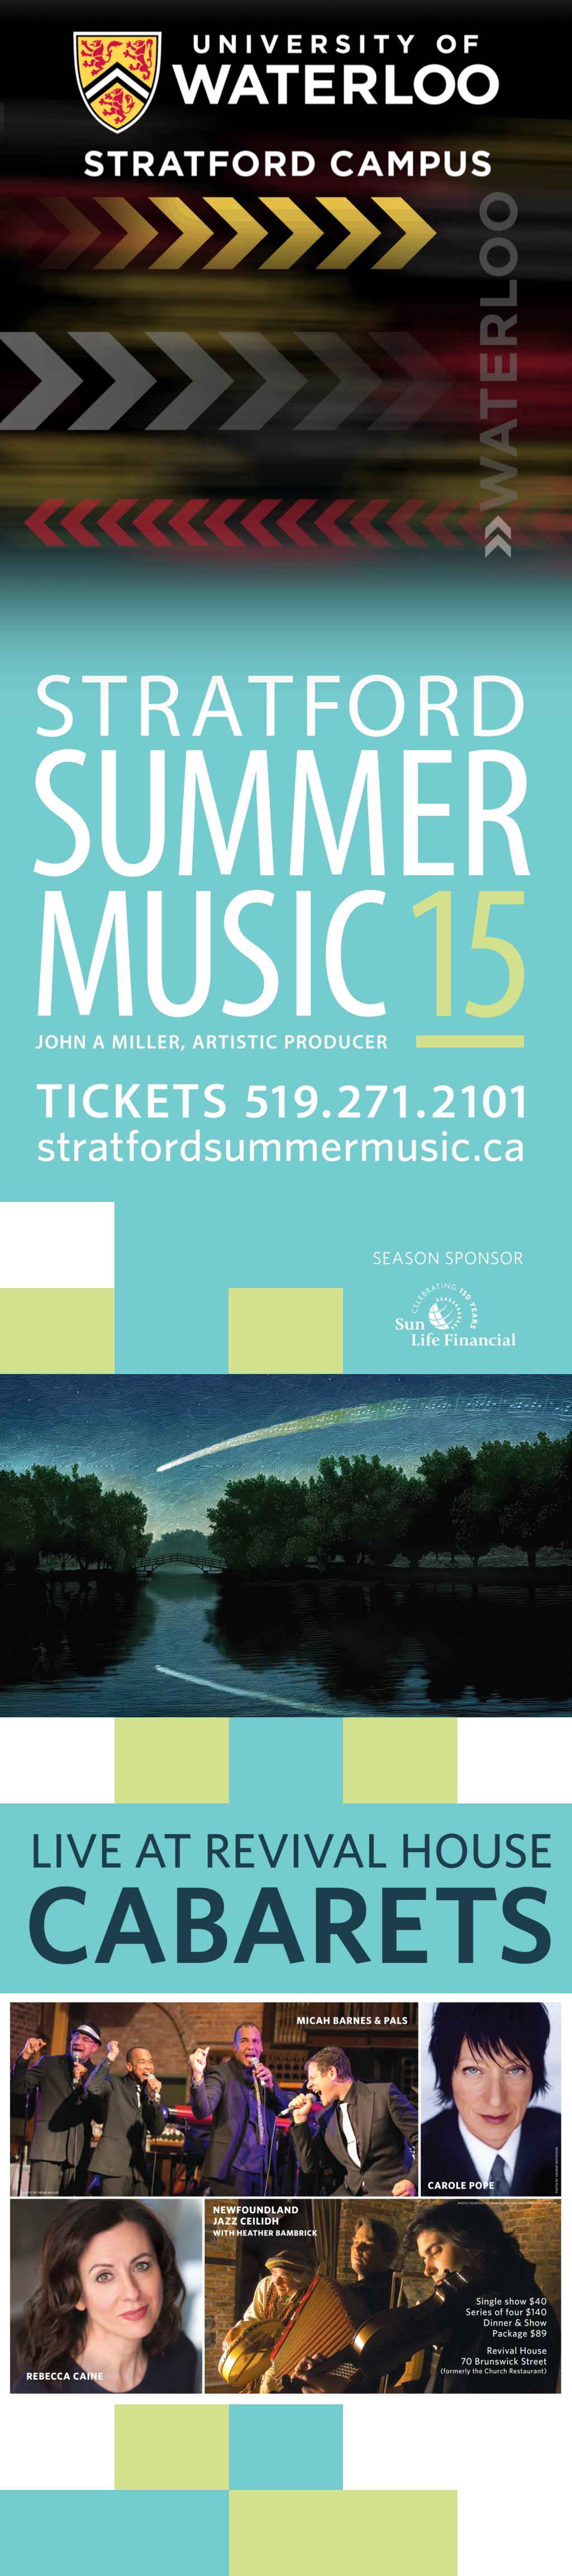 stratSummerMusic2015.png